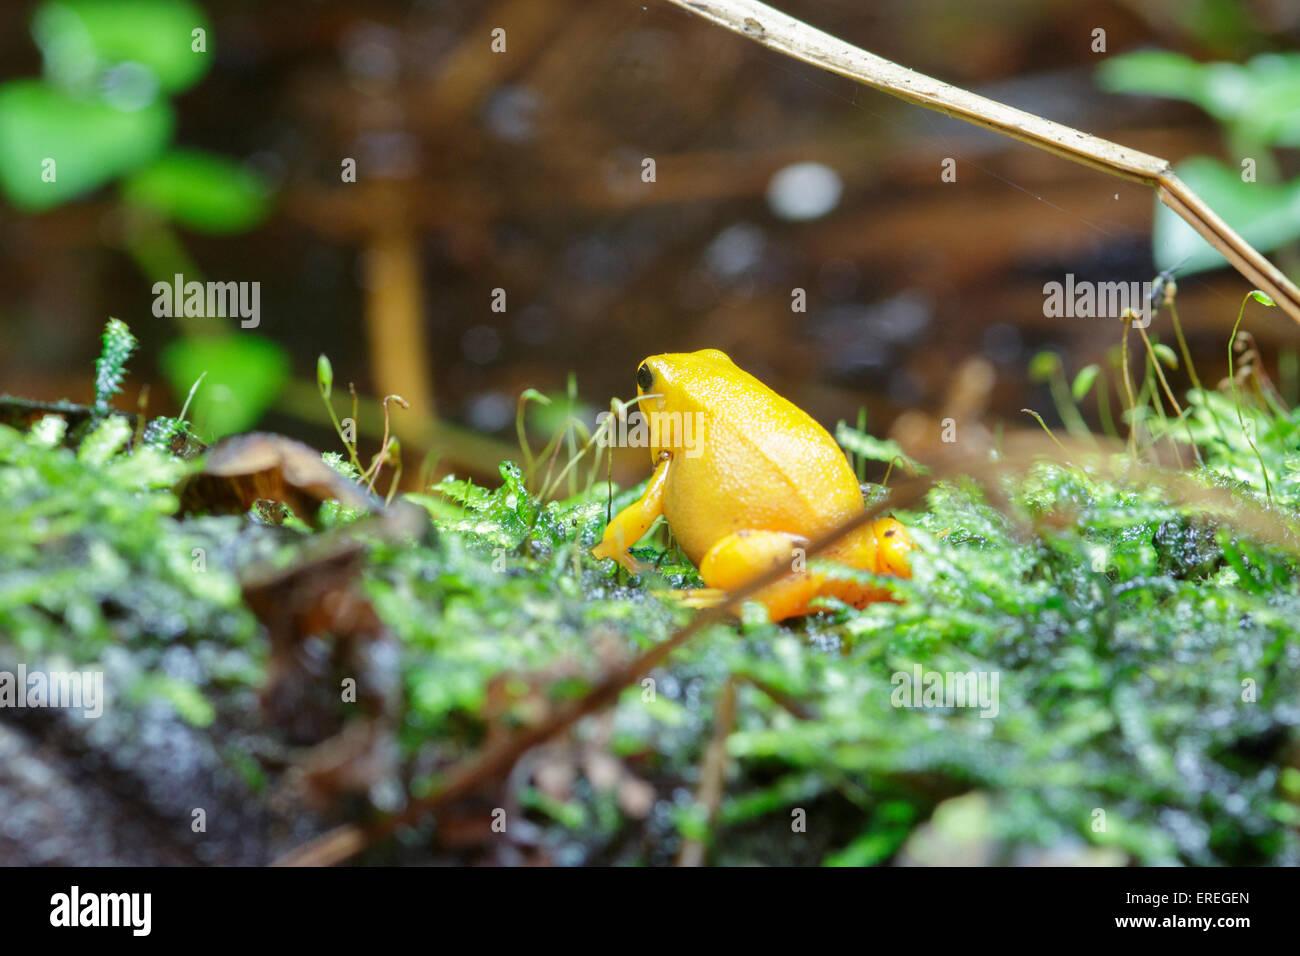 Colorful Golden Dart Frog Poison Dart Frog In Terrarium Stock Photo